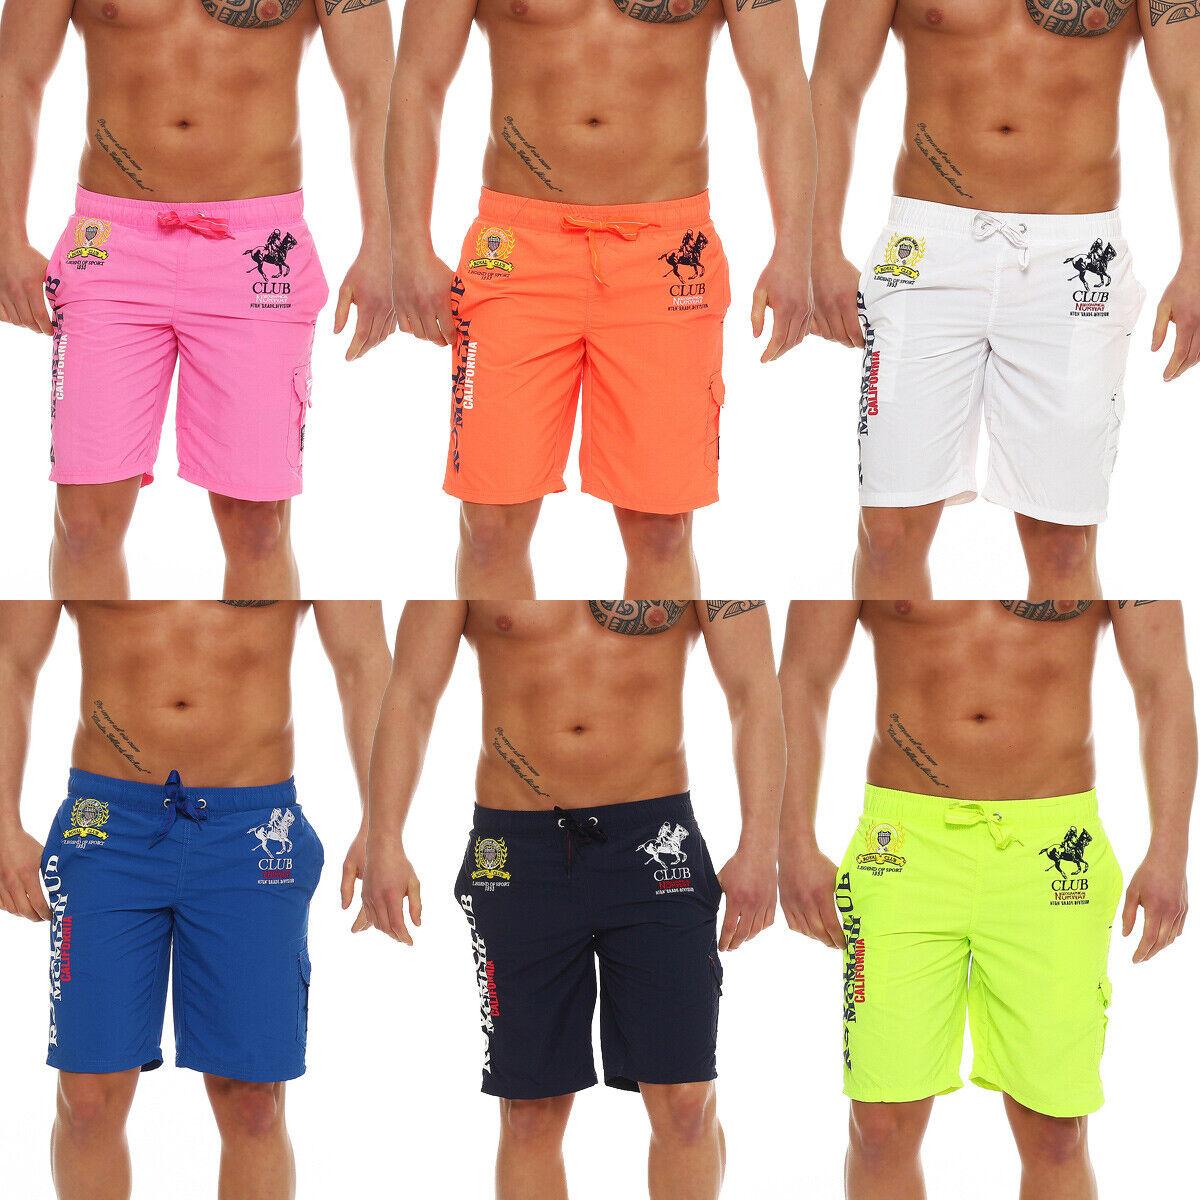 Herren Badeshorts Badehose Shorts Sport Bermudas Schwimmen Swimshort Boardshorts